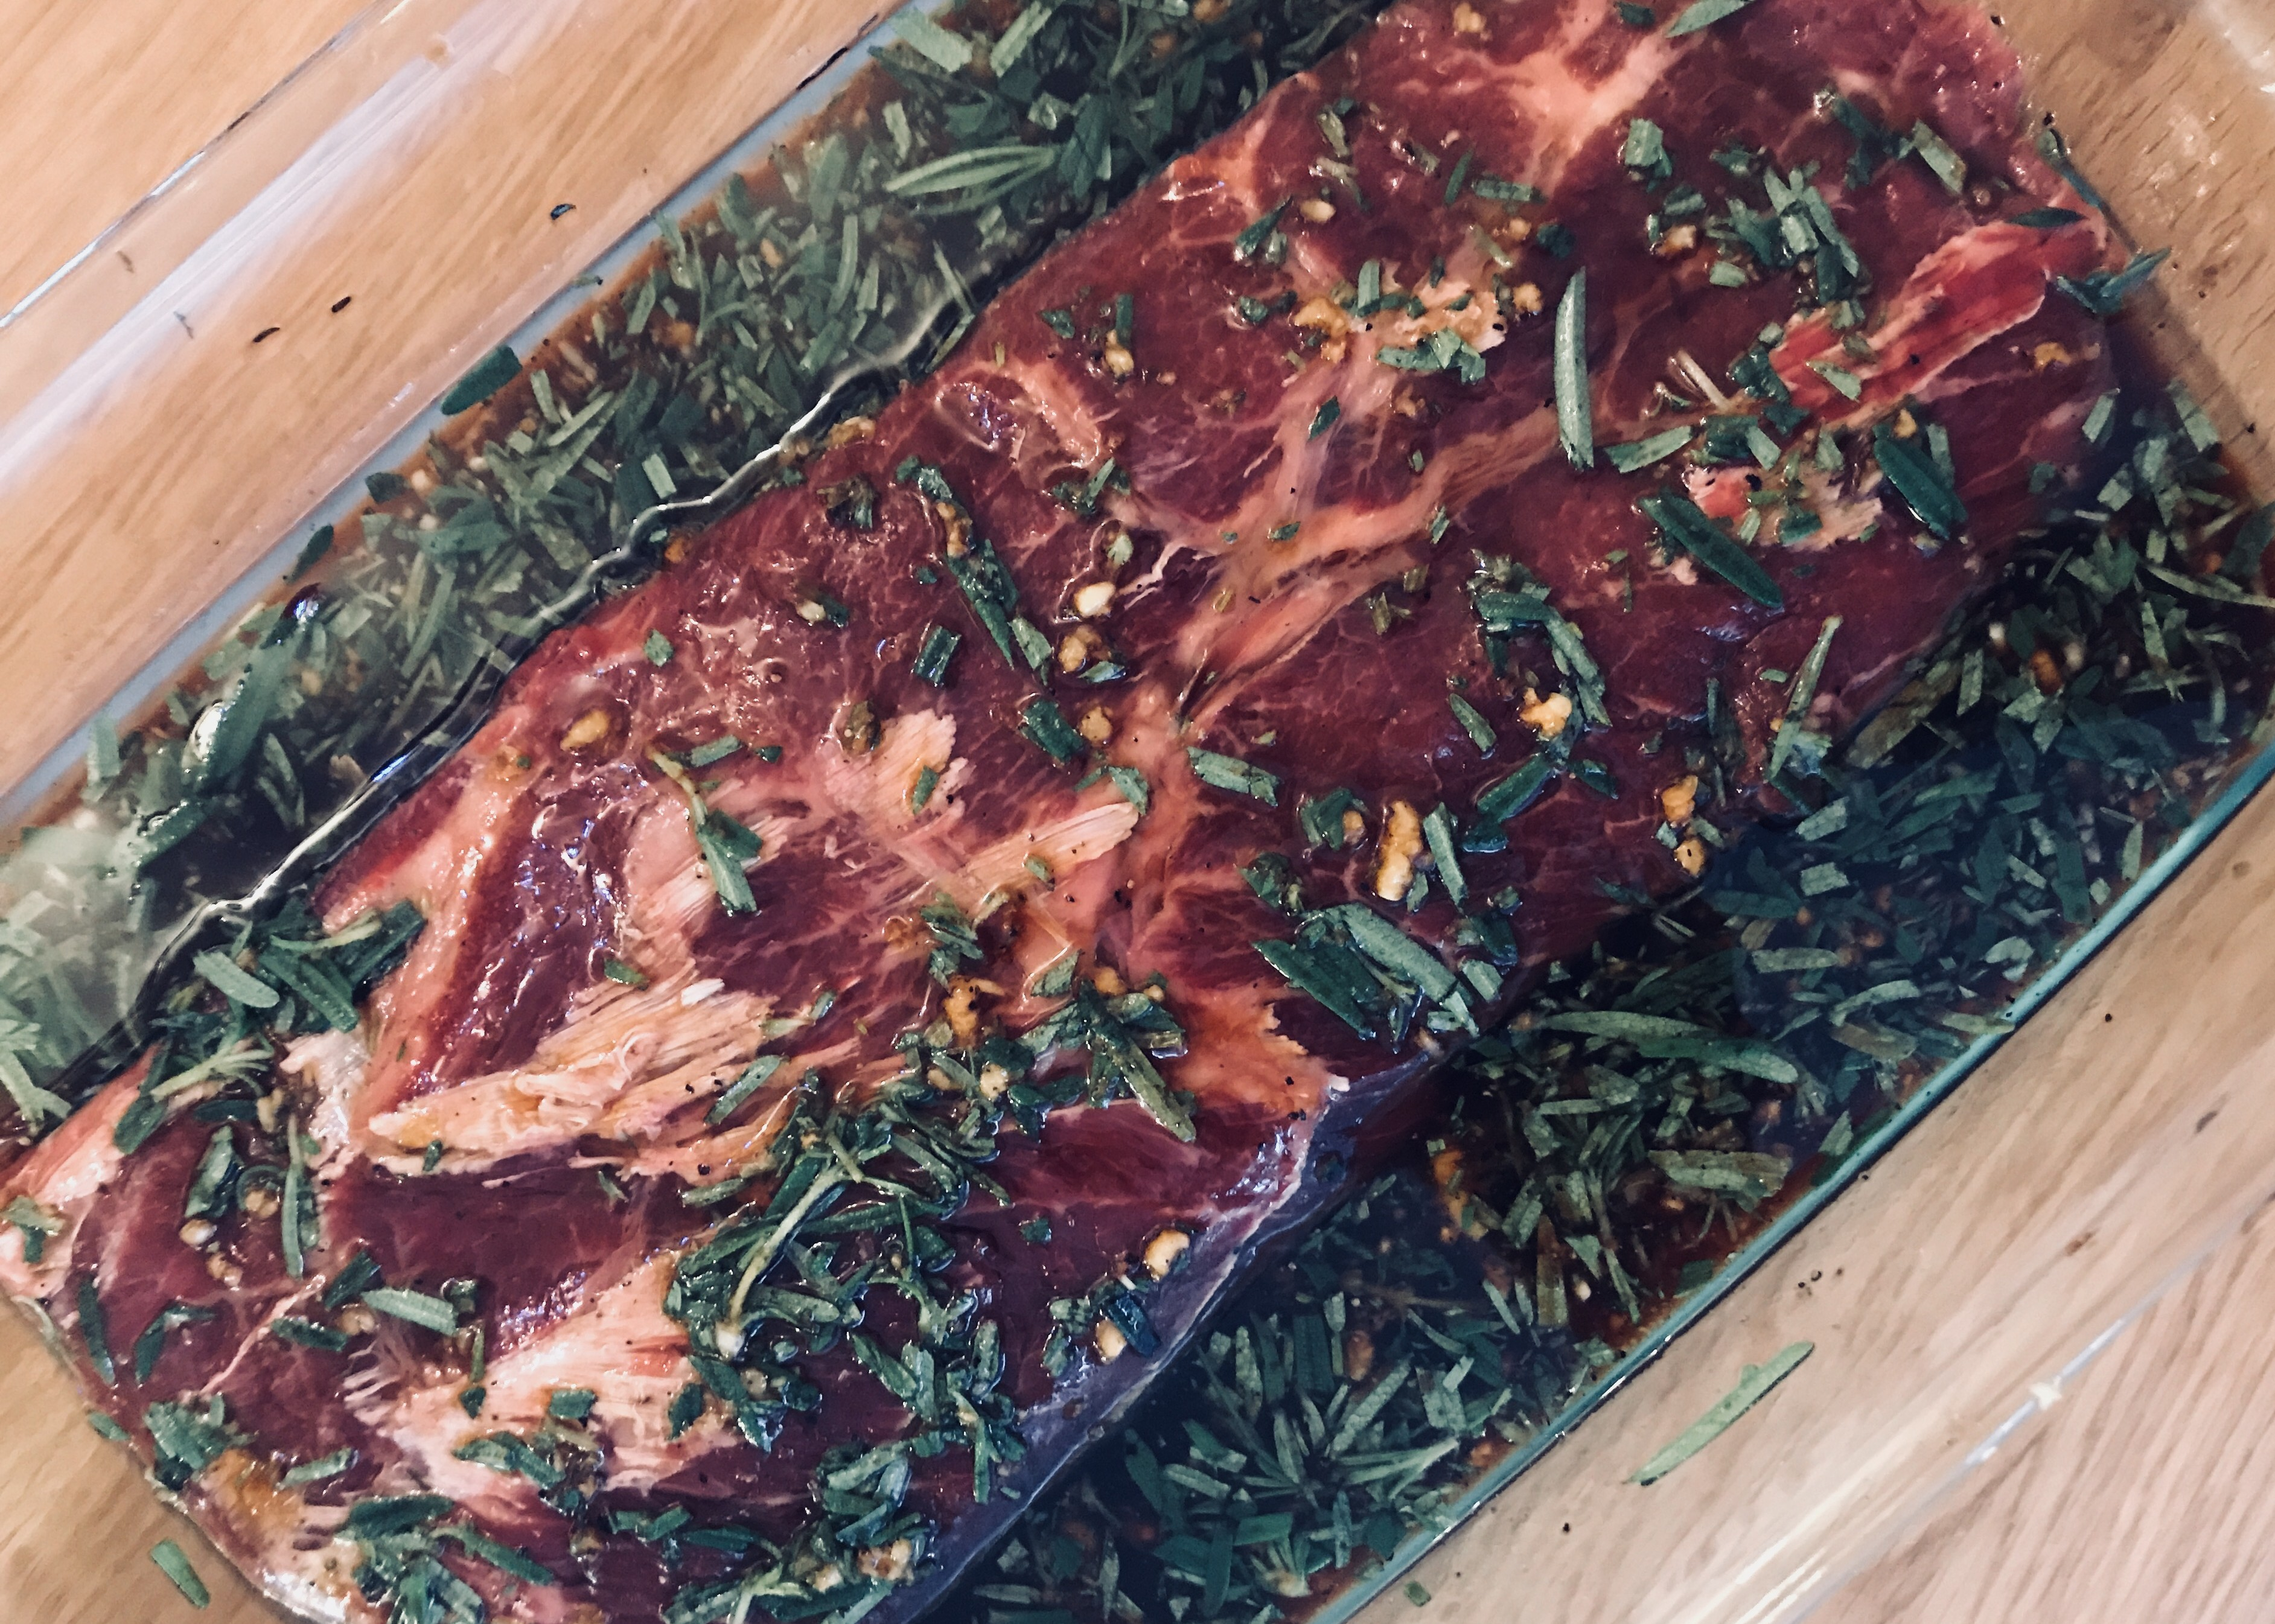 marinated grass fed flank steak in fresh rosemary